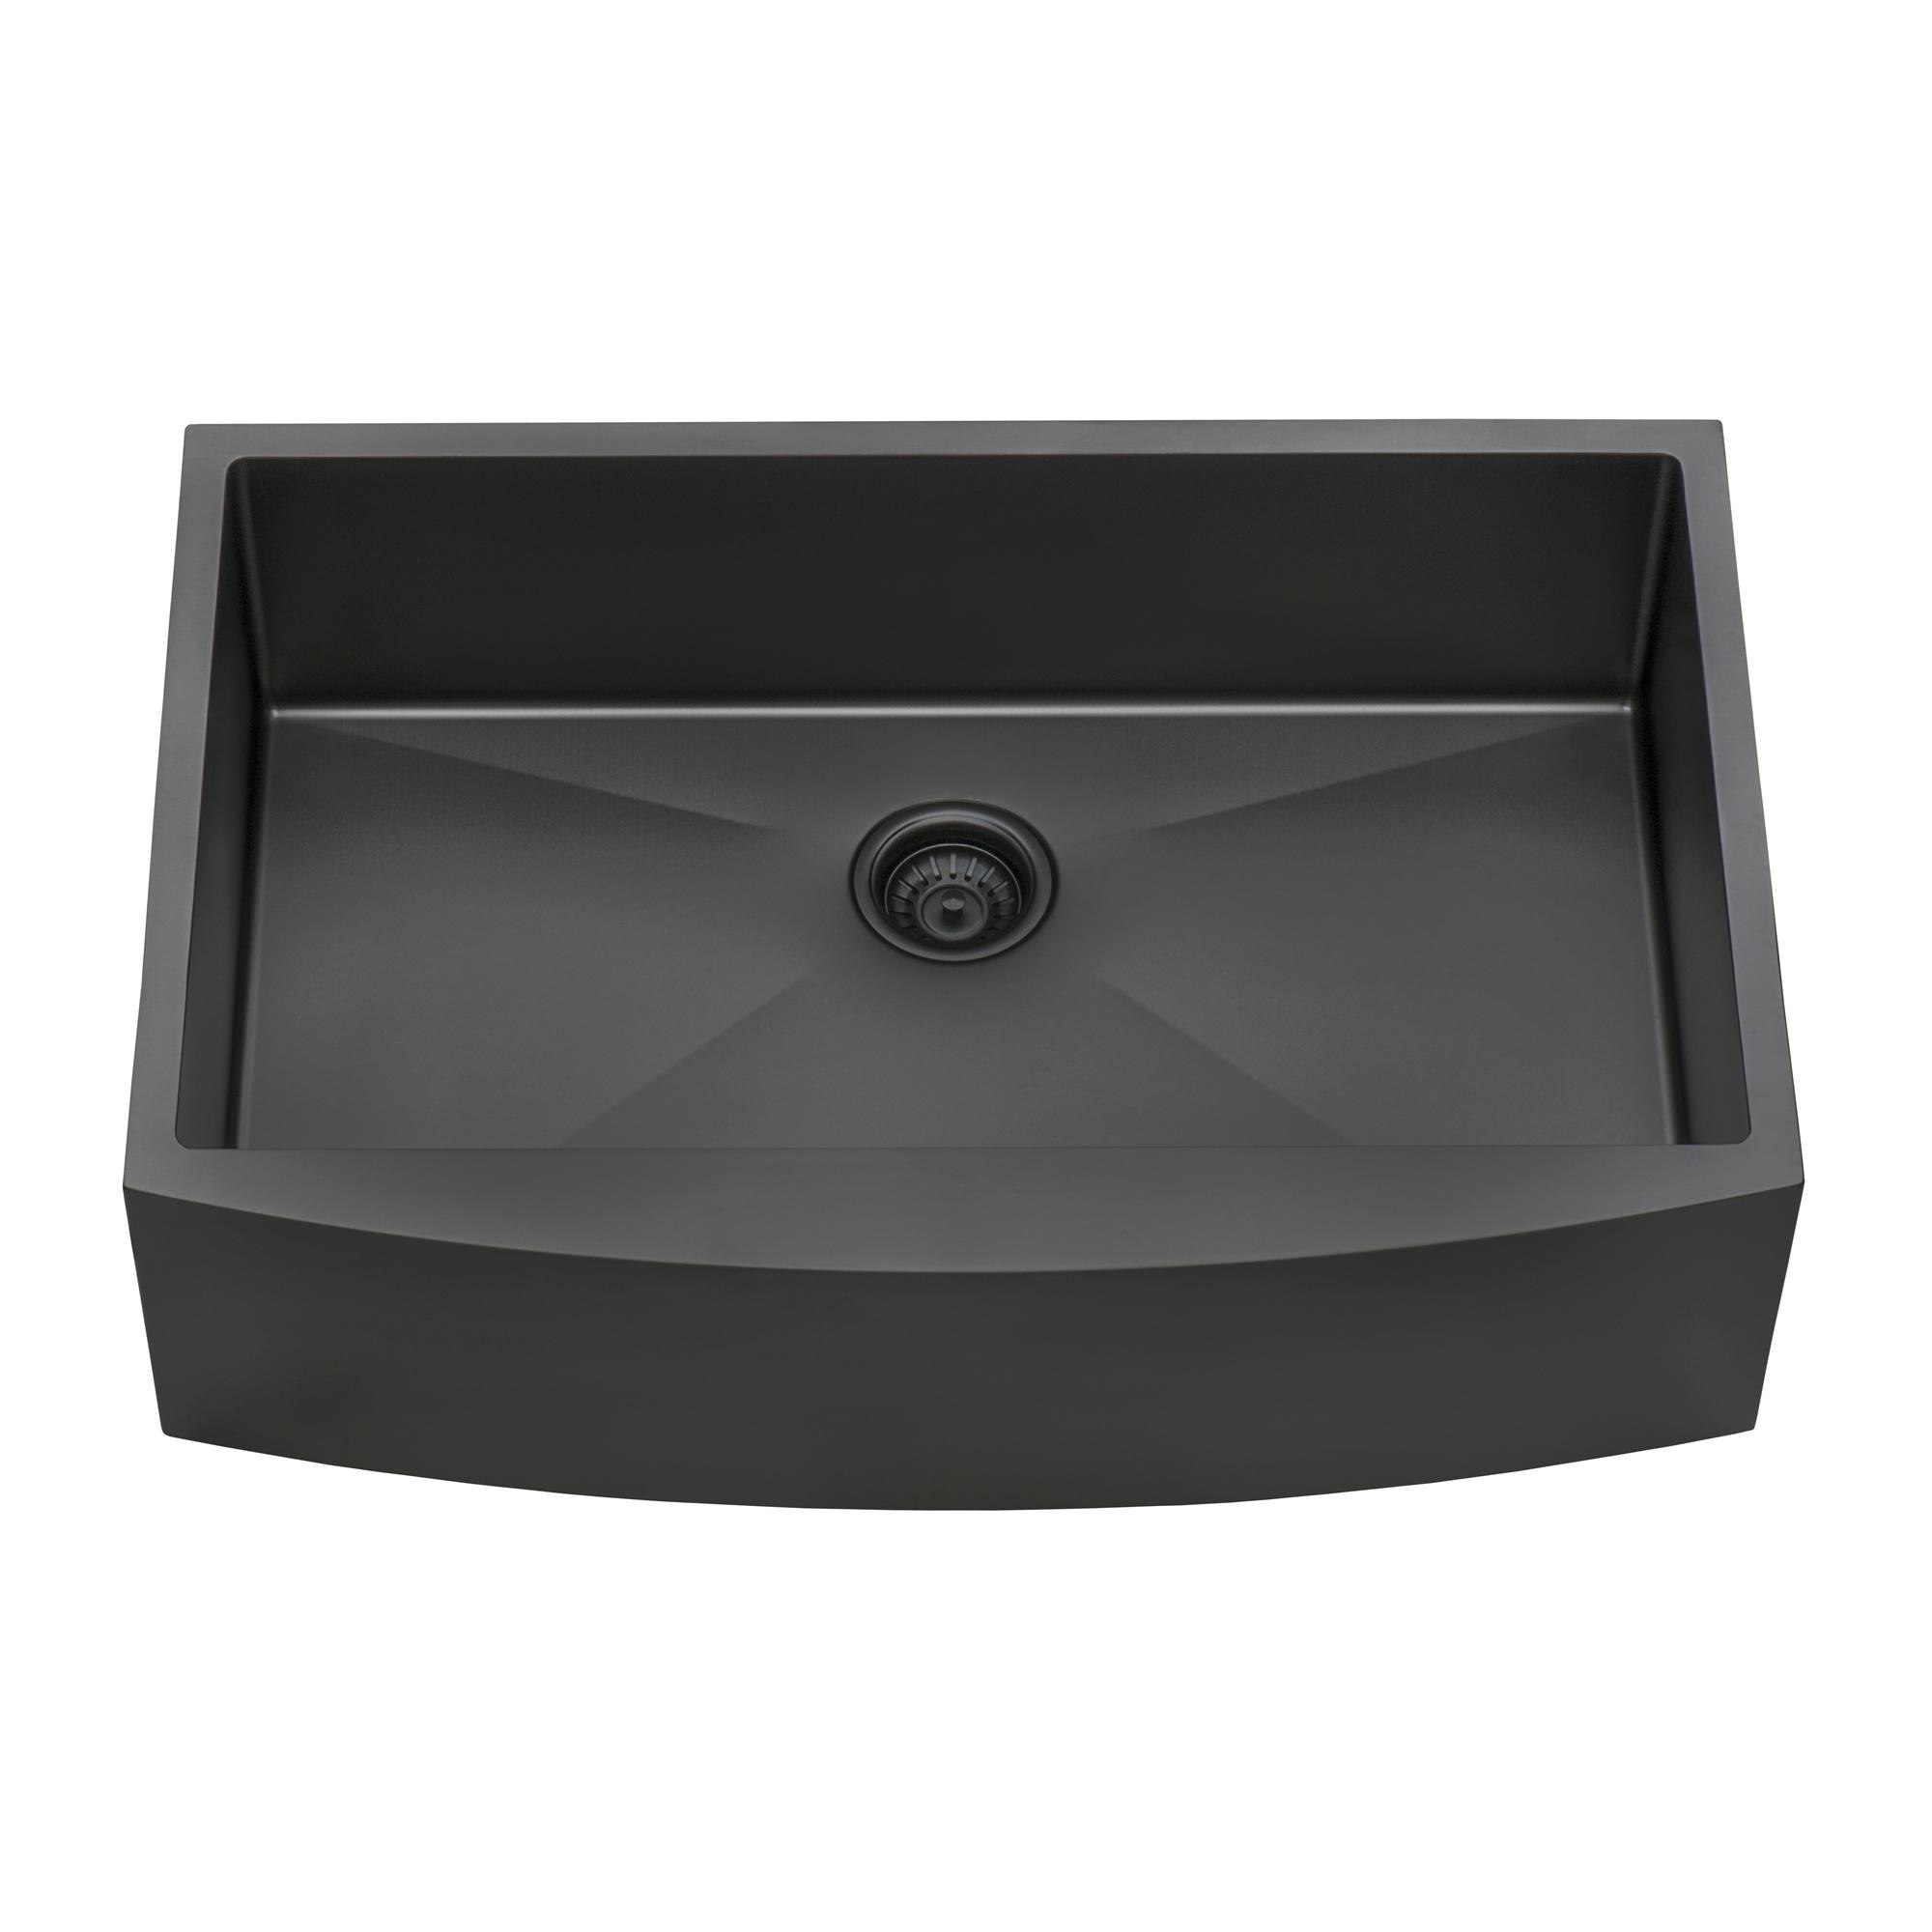 36-inch Apron-Front Farmhouse Kitchen Sink - Gunmetal Black Matte Stainless  Steel Single Bowl